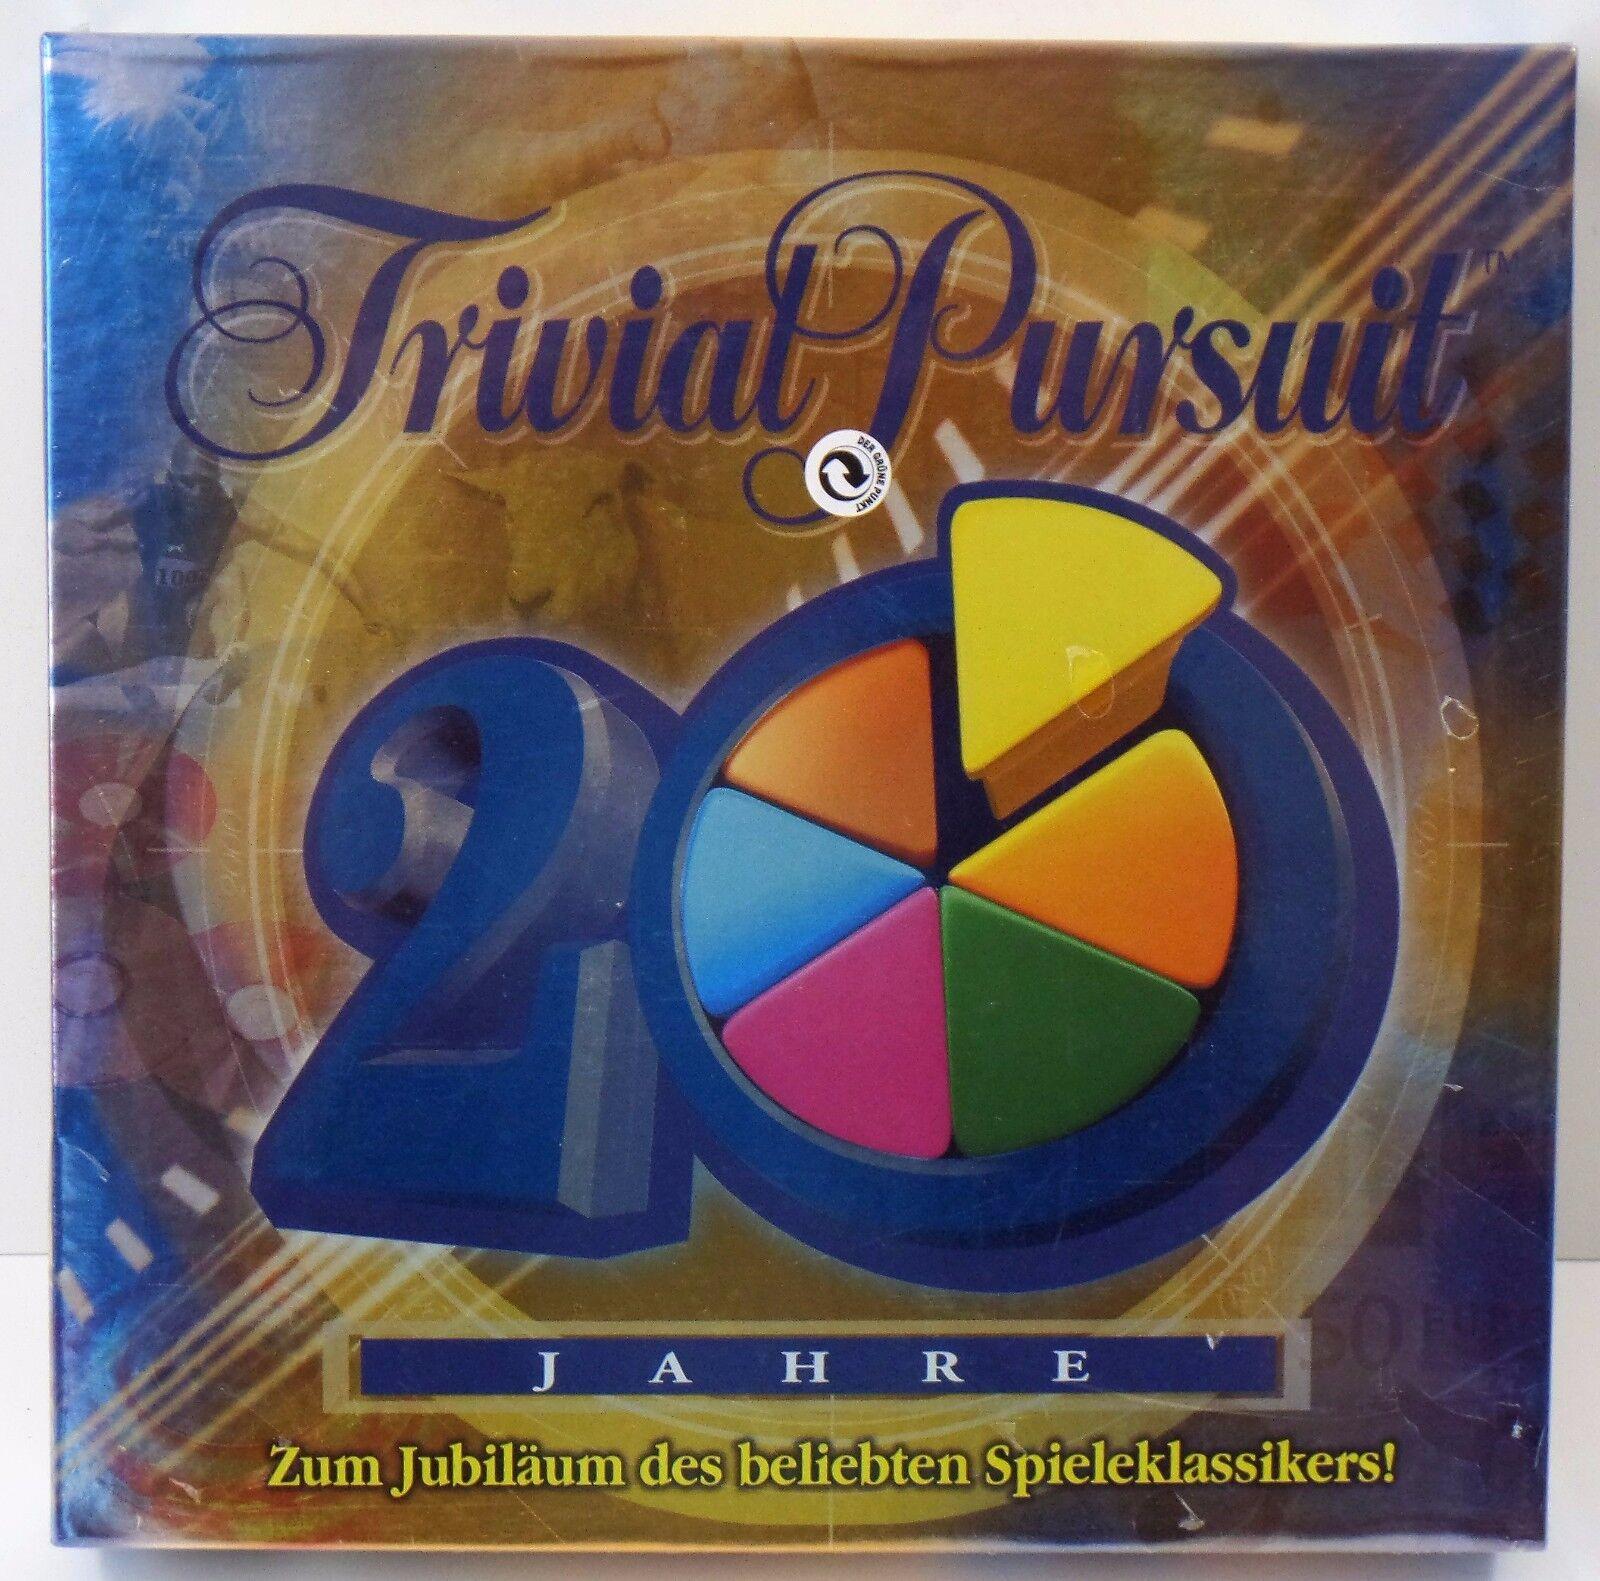 Parker Trivial Pursuit 20 anni Giubileo-NUOVO NEW